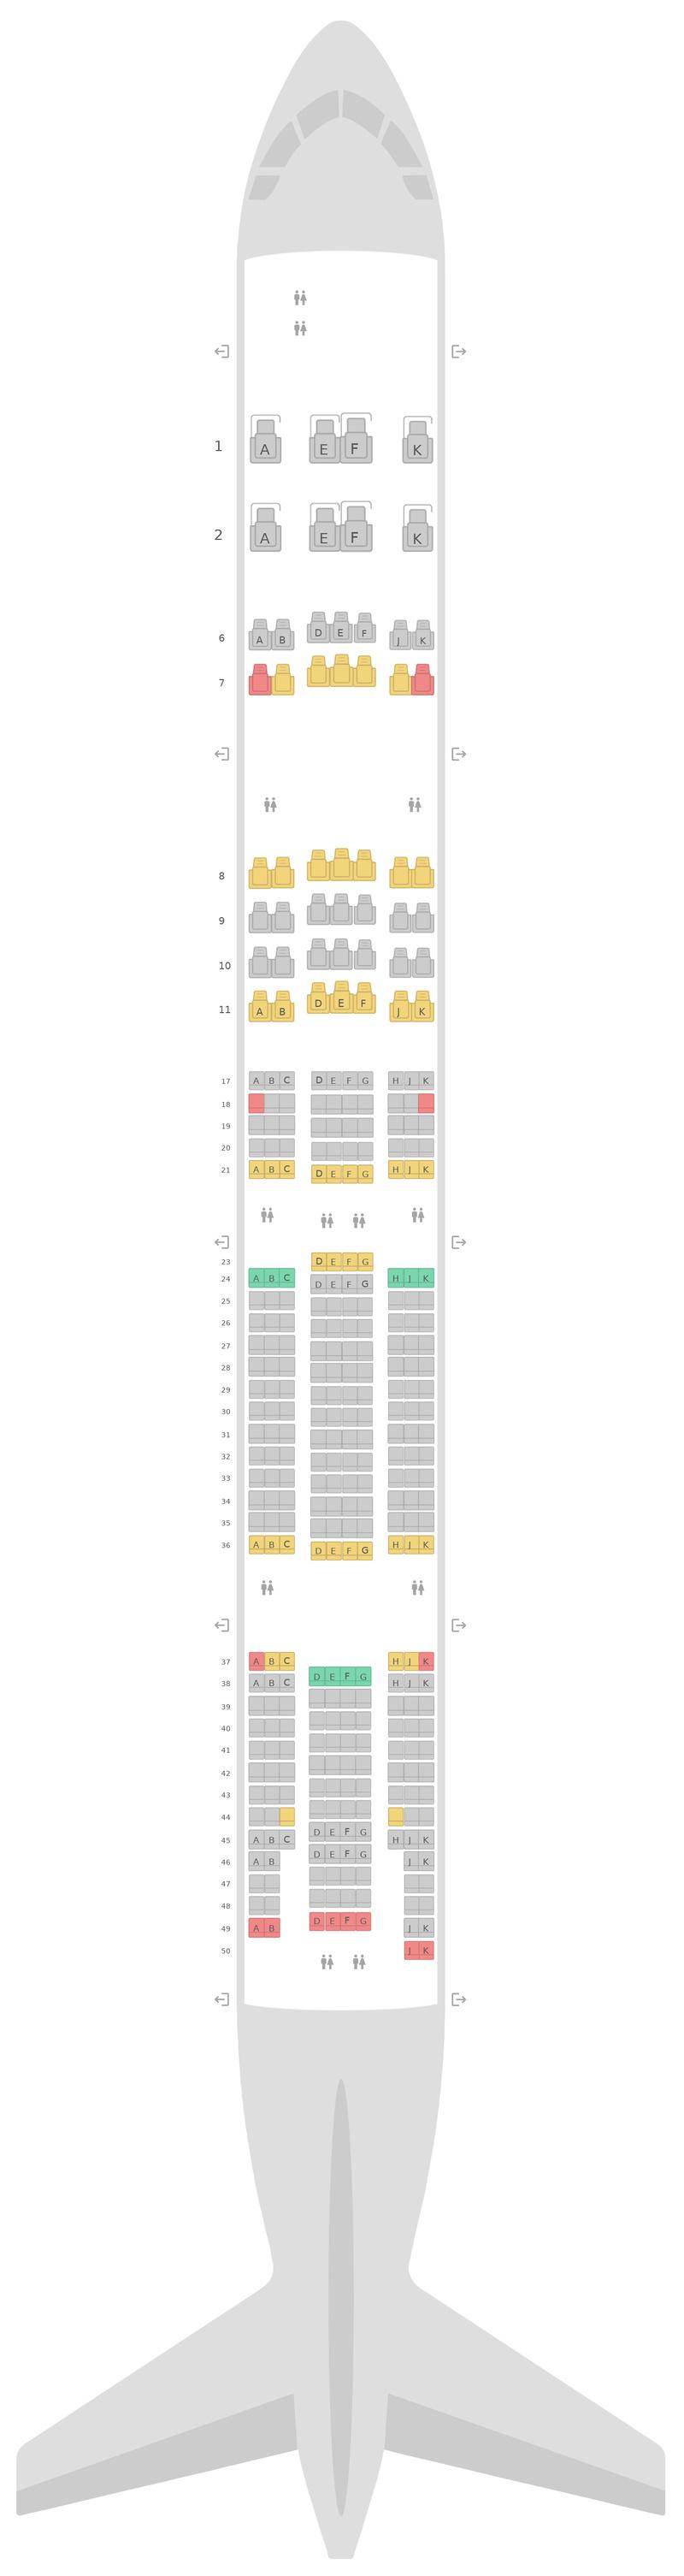 Mapa de asientos Boeing 777-300ER (77W) 3 Class Emirates